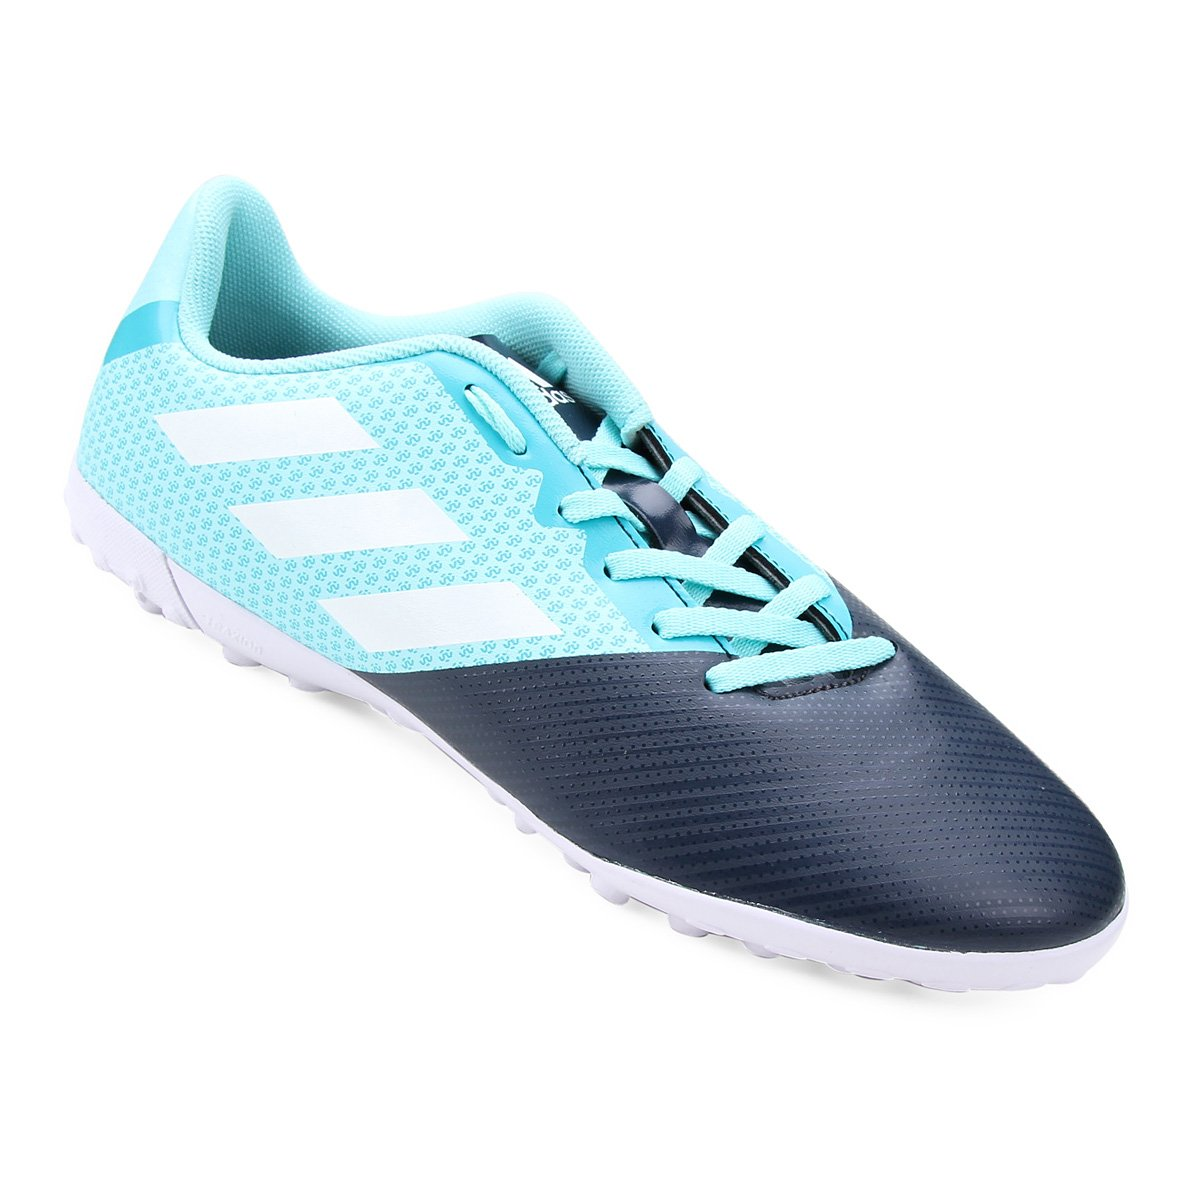 Chuteira Society Adidas Artilheira 17 TF d68b7ebc3d3b3